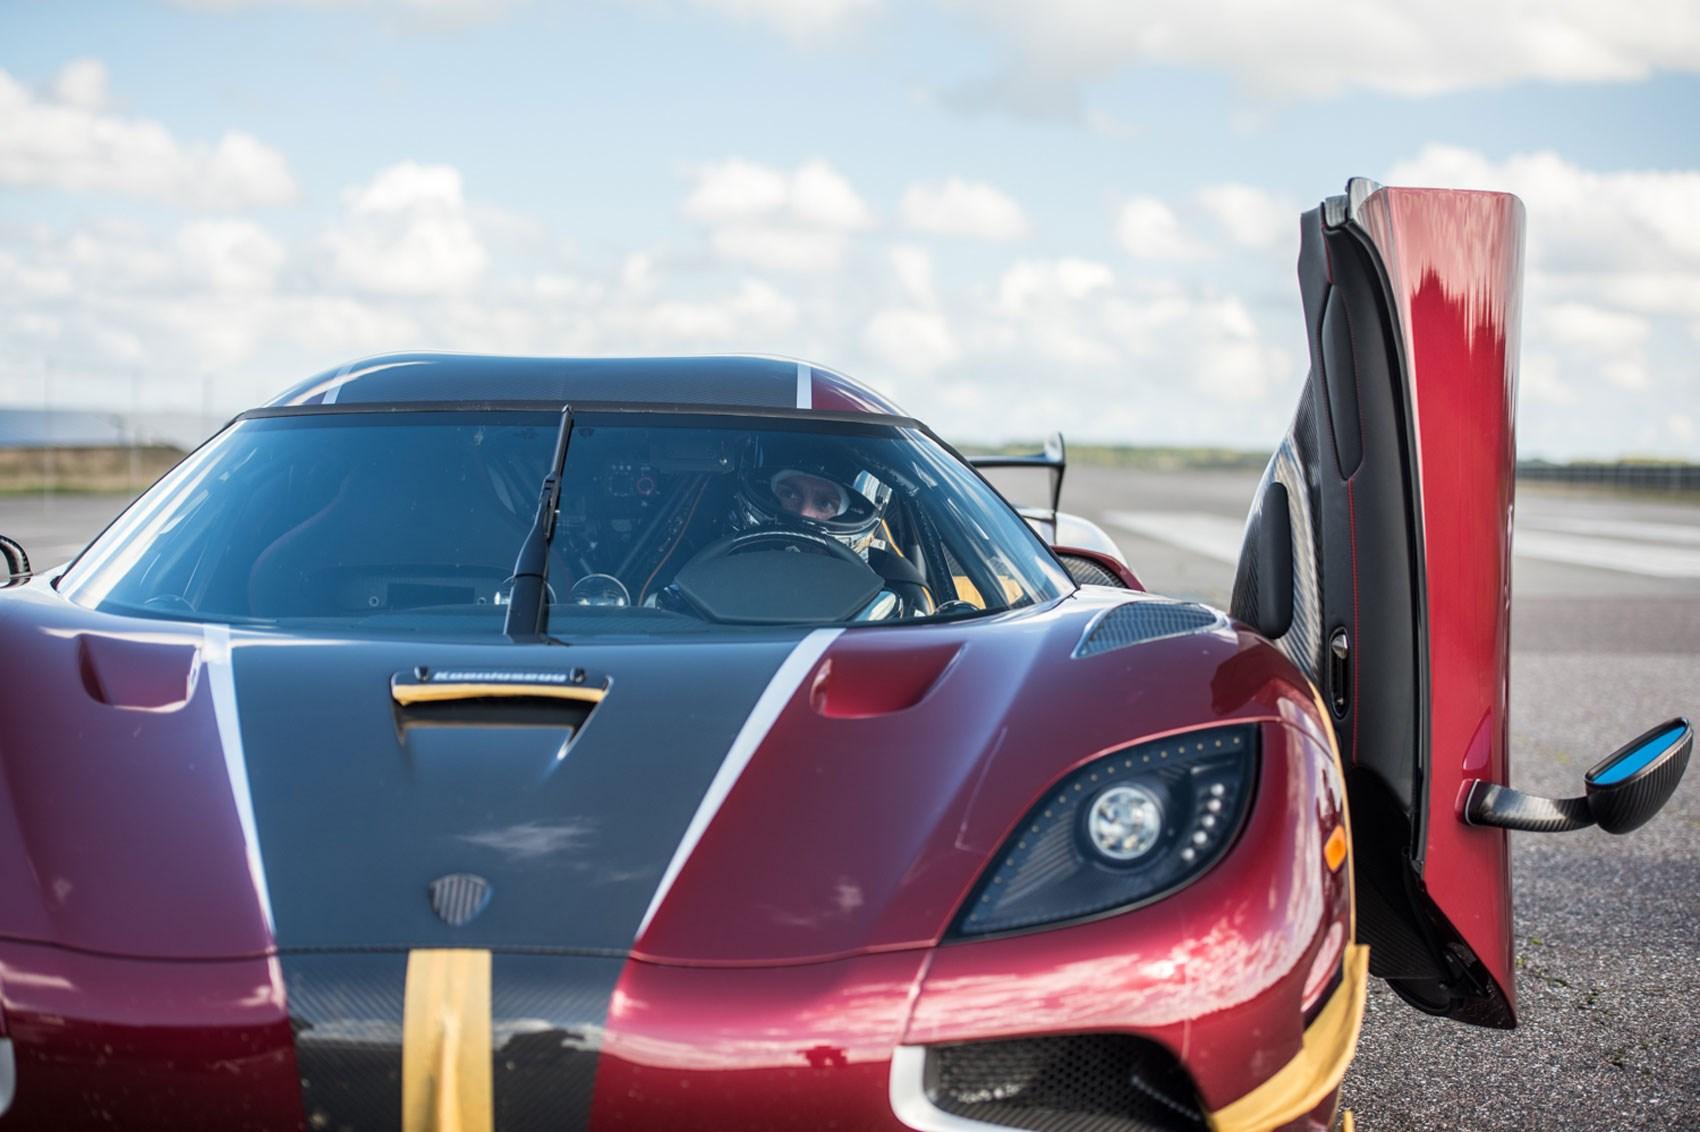 Watch: Koenigsegg Agera RS Smashes 0-249mph-0 World Record